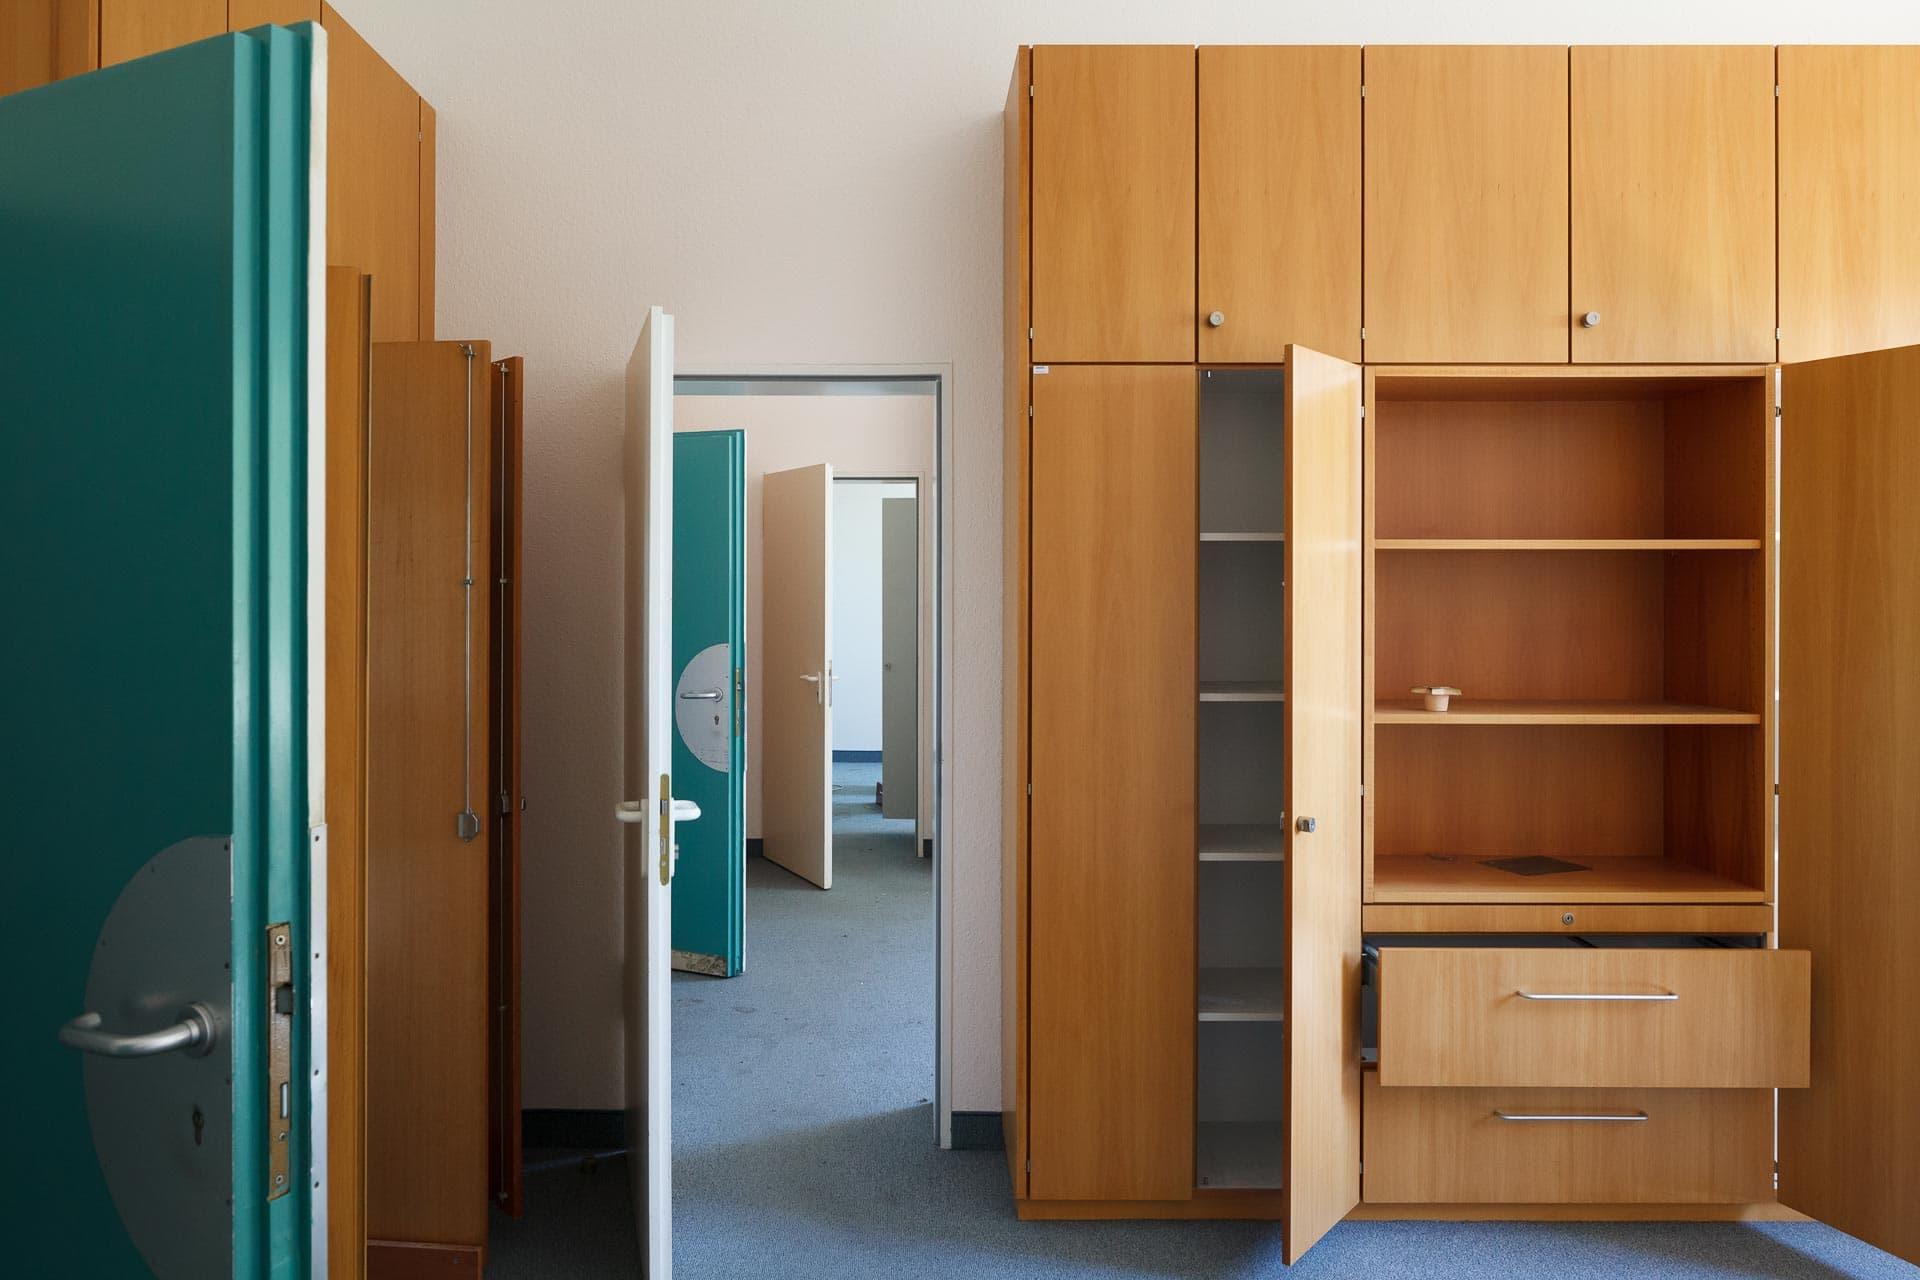 Verlassene Orte. Lost Places: Verlassene Klinik, Ulm